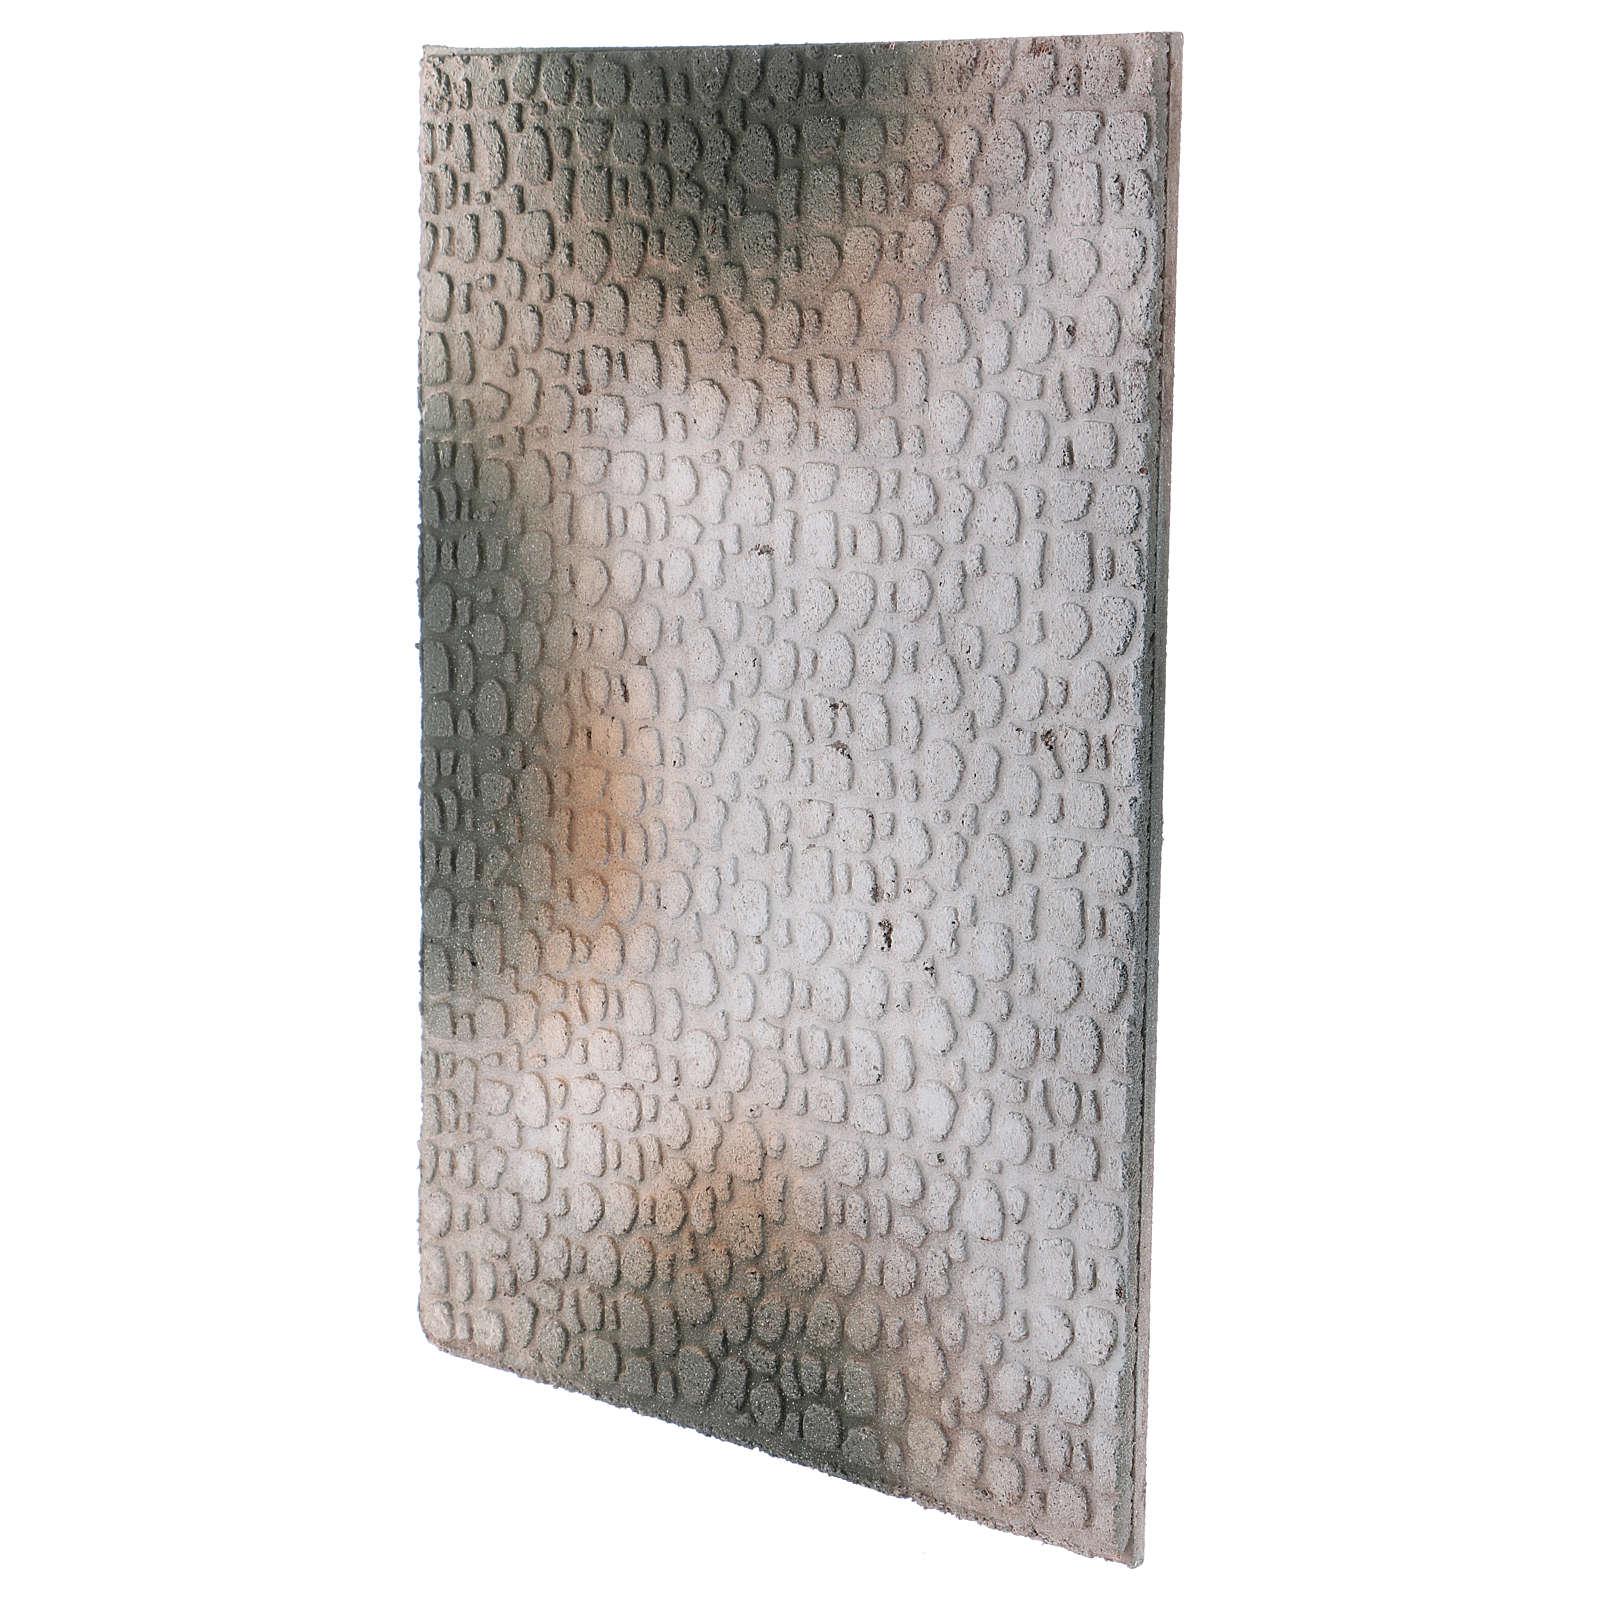 Base 1x30x40 cm en liège pour crèche orientale 7 cm 4